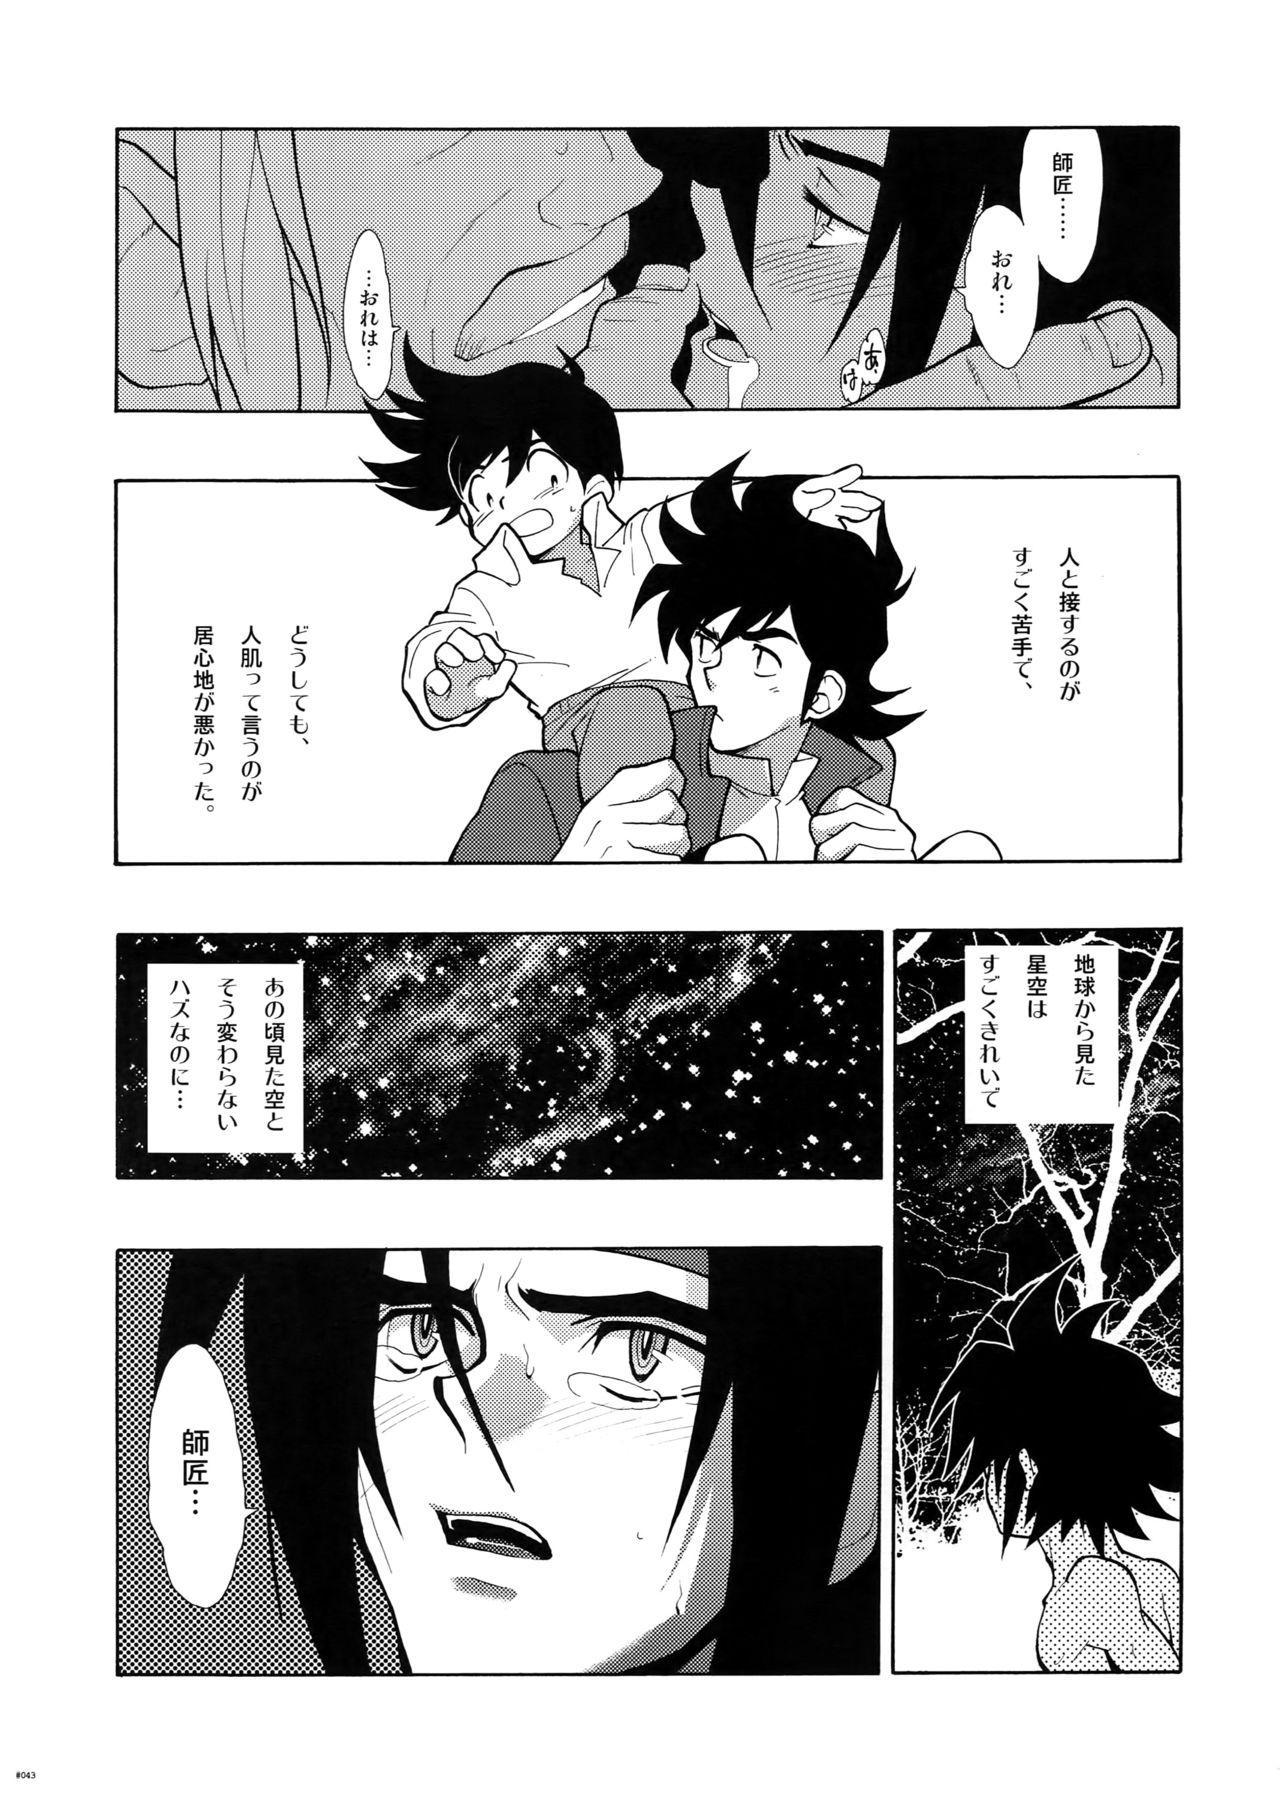 [Article 60 of Criminal Code (Shuhan)] G-gan Josei-Muke Sairoku-Shuu (G Gundam) 42